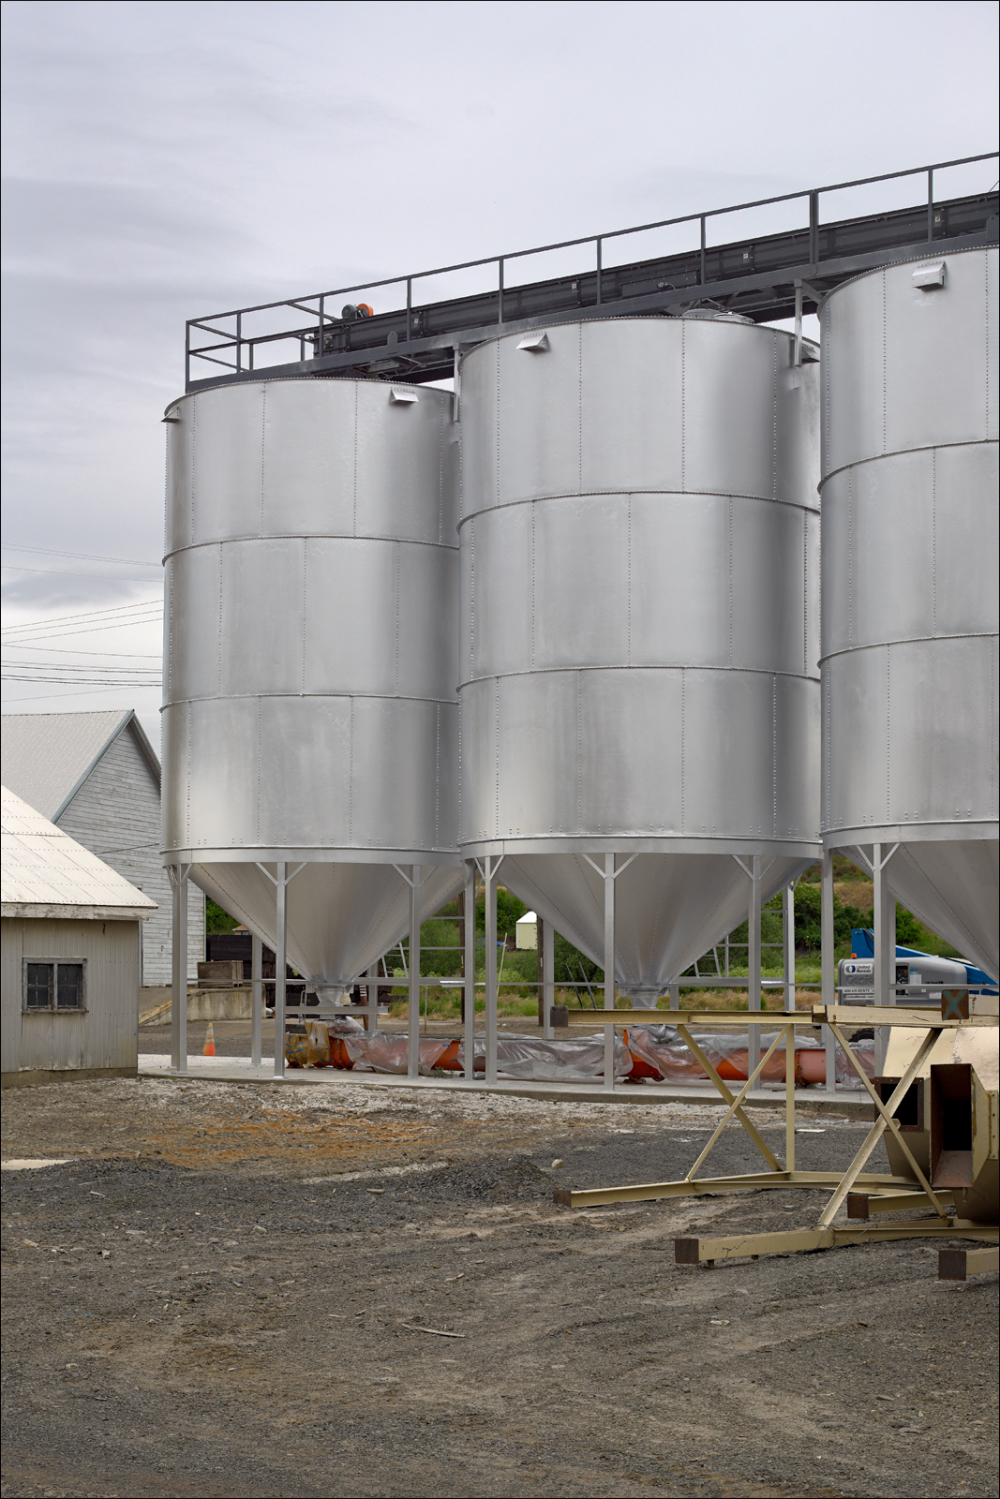 Freshly painted storage silos